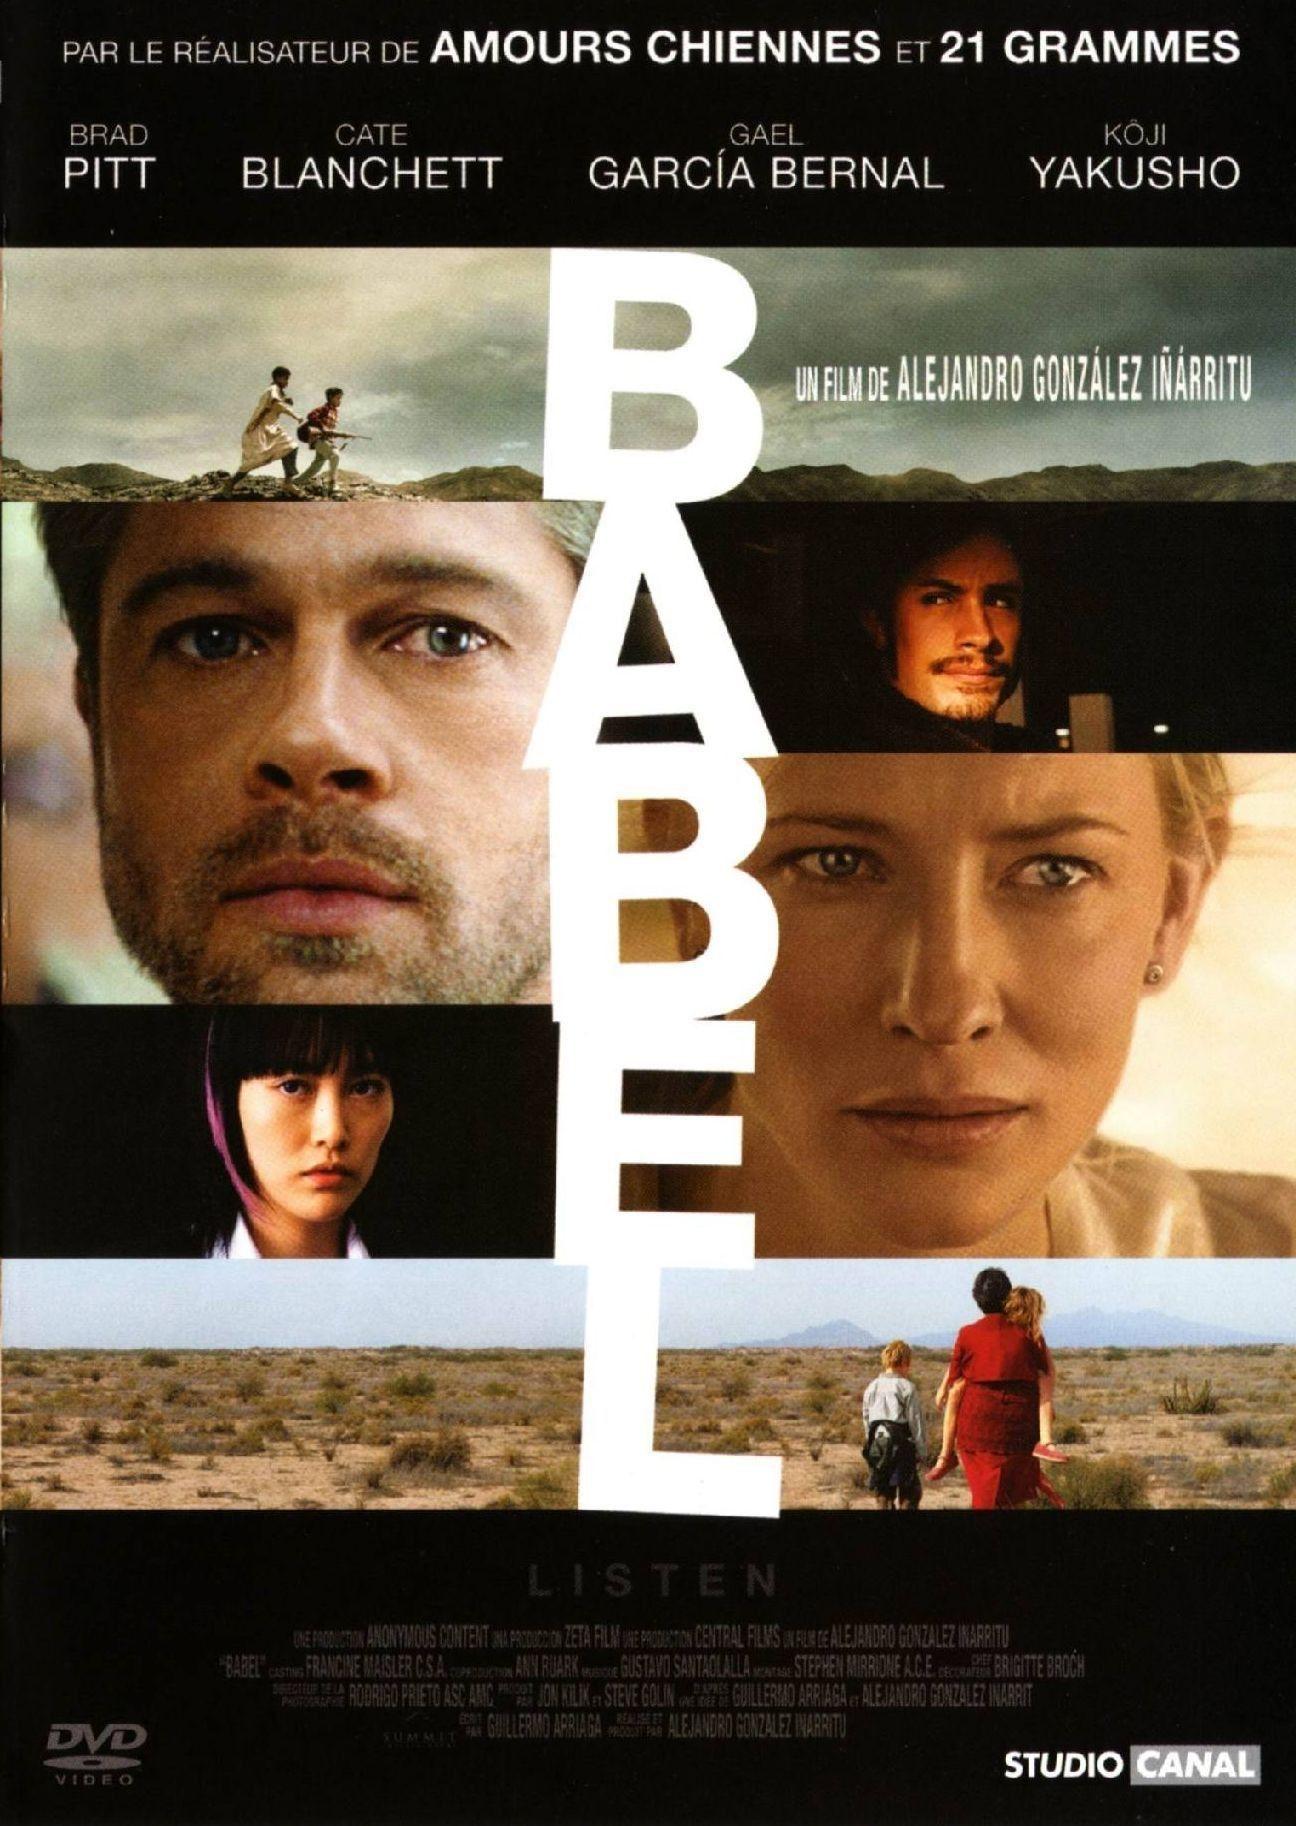 Babel (2006) - Regarder Films Gratuit en Ligne - Regarder Babel Gratuit en Ligne #Babel - http://mwfo.pro/142328